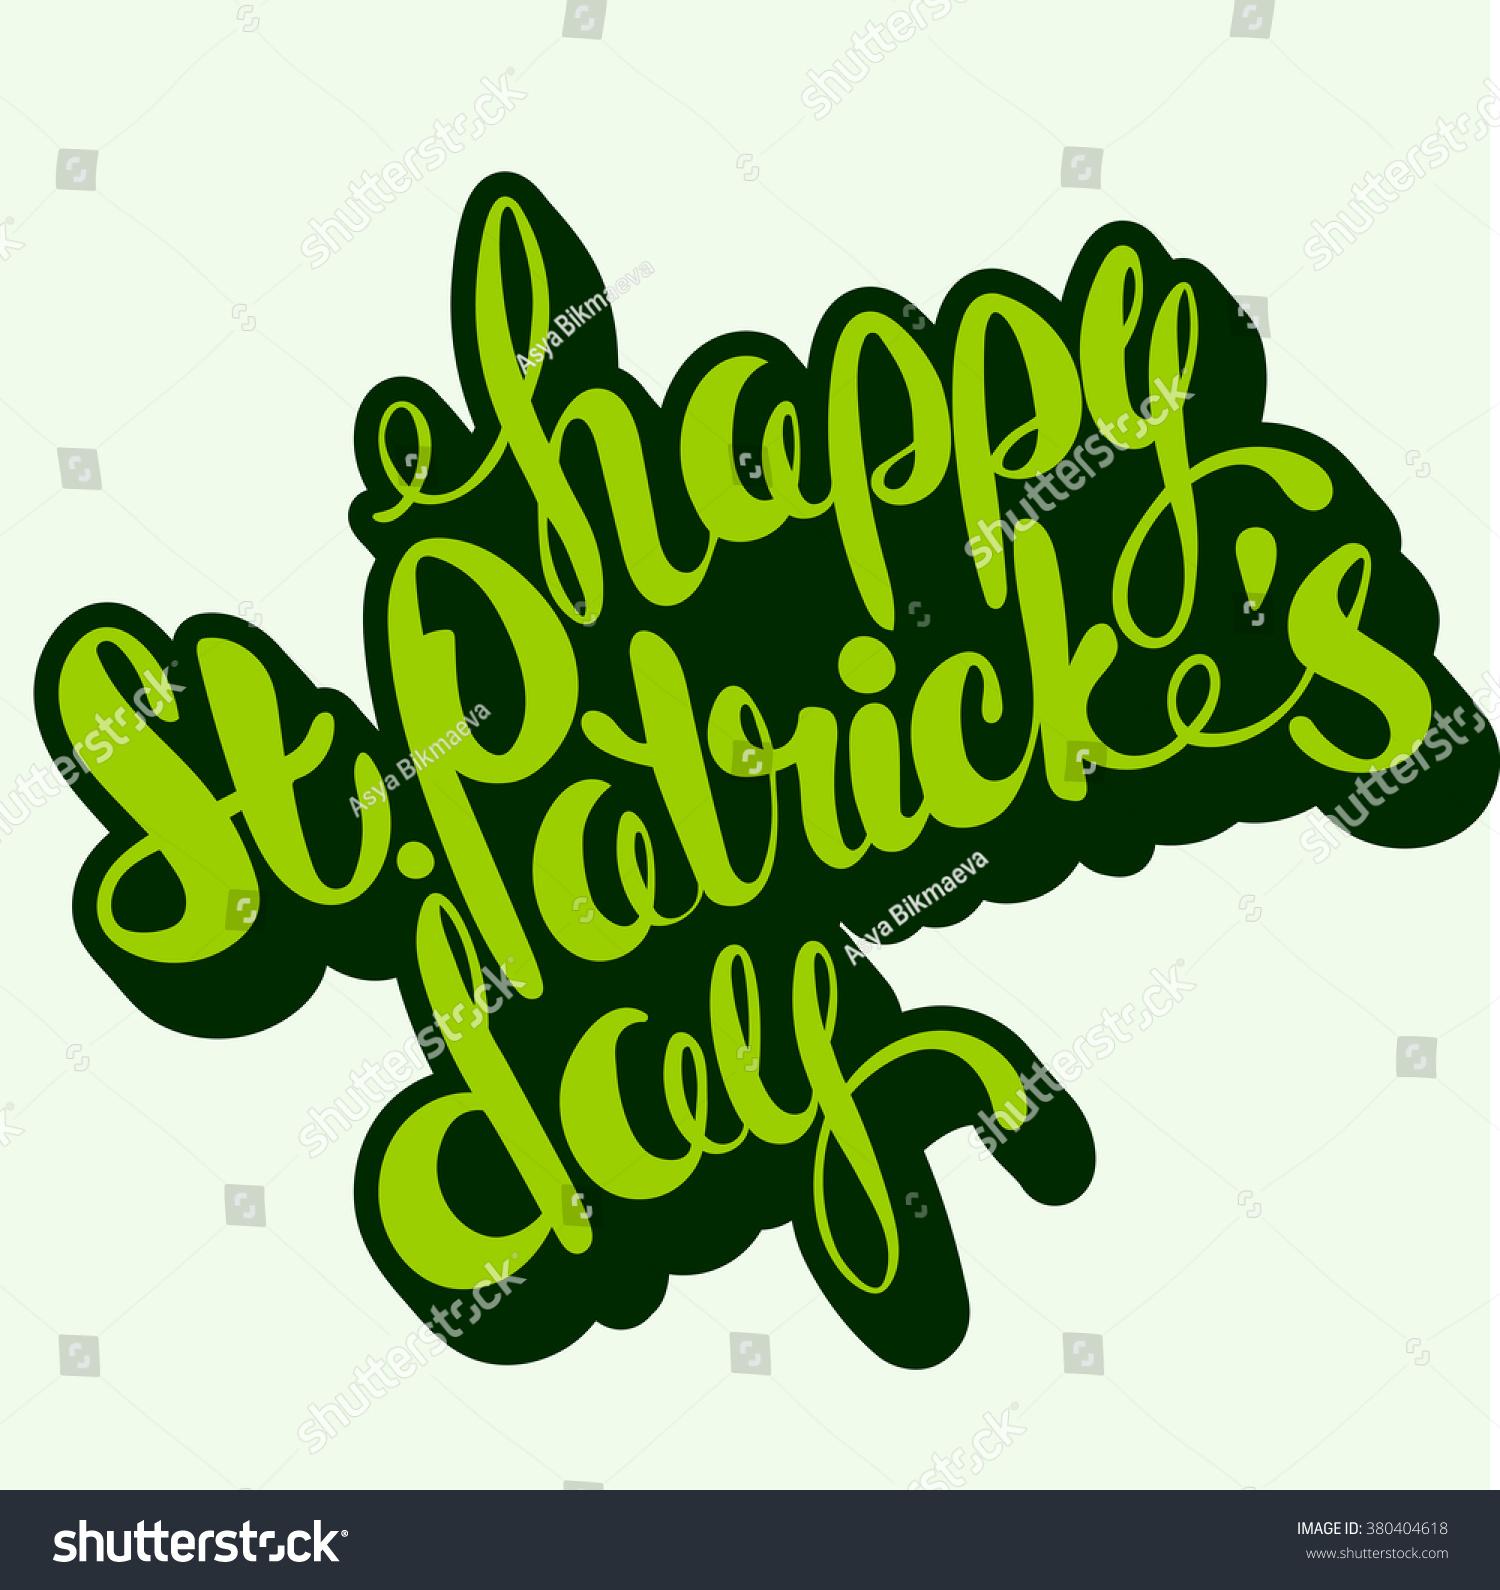 St Patricks Day Greeting Lettering Happy St Patricks Day